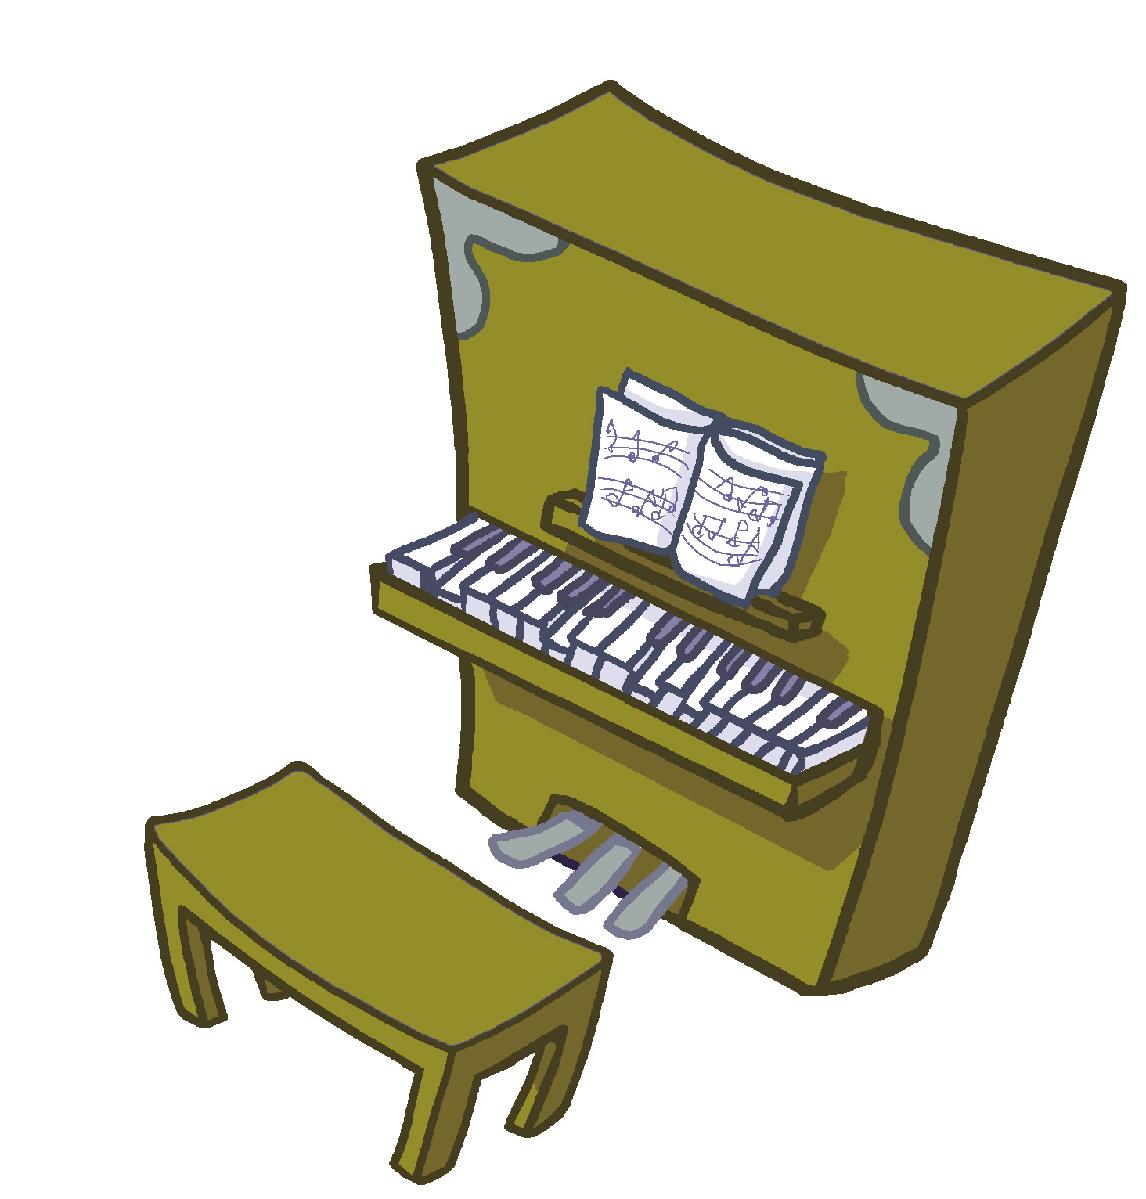 music lessons clip art - photo #44